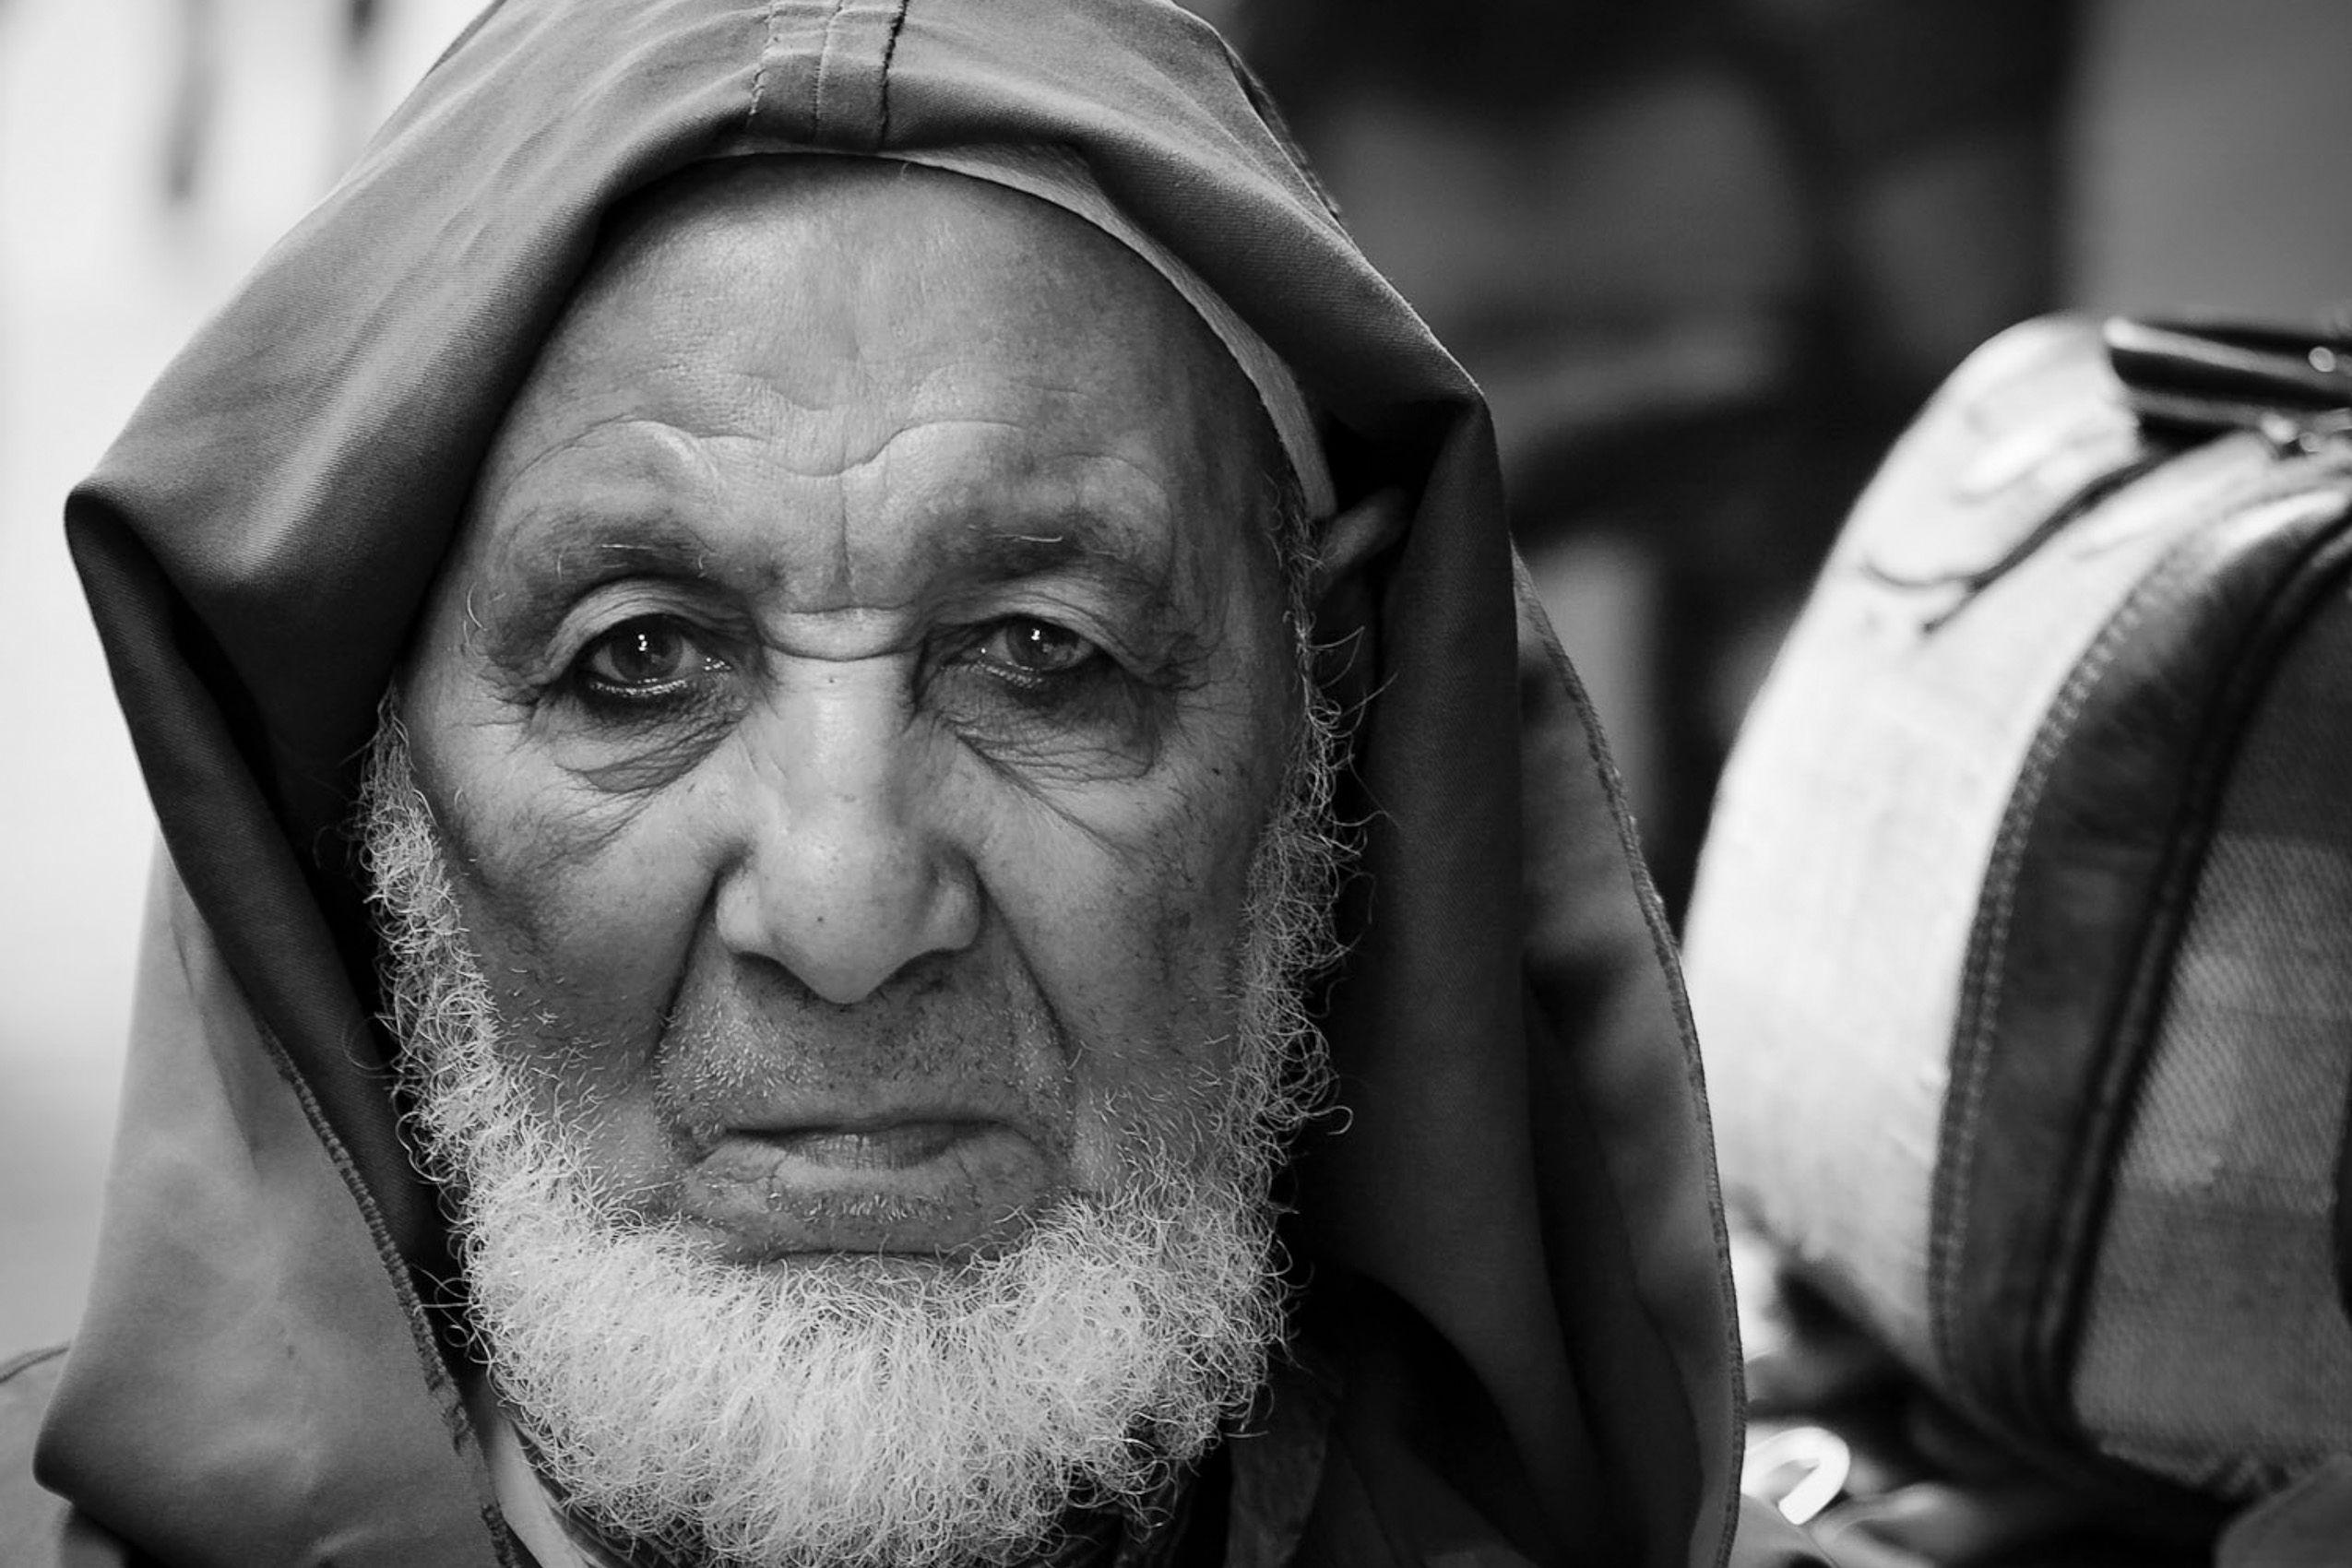 morocco_marrakech_man_portrait.jpg